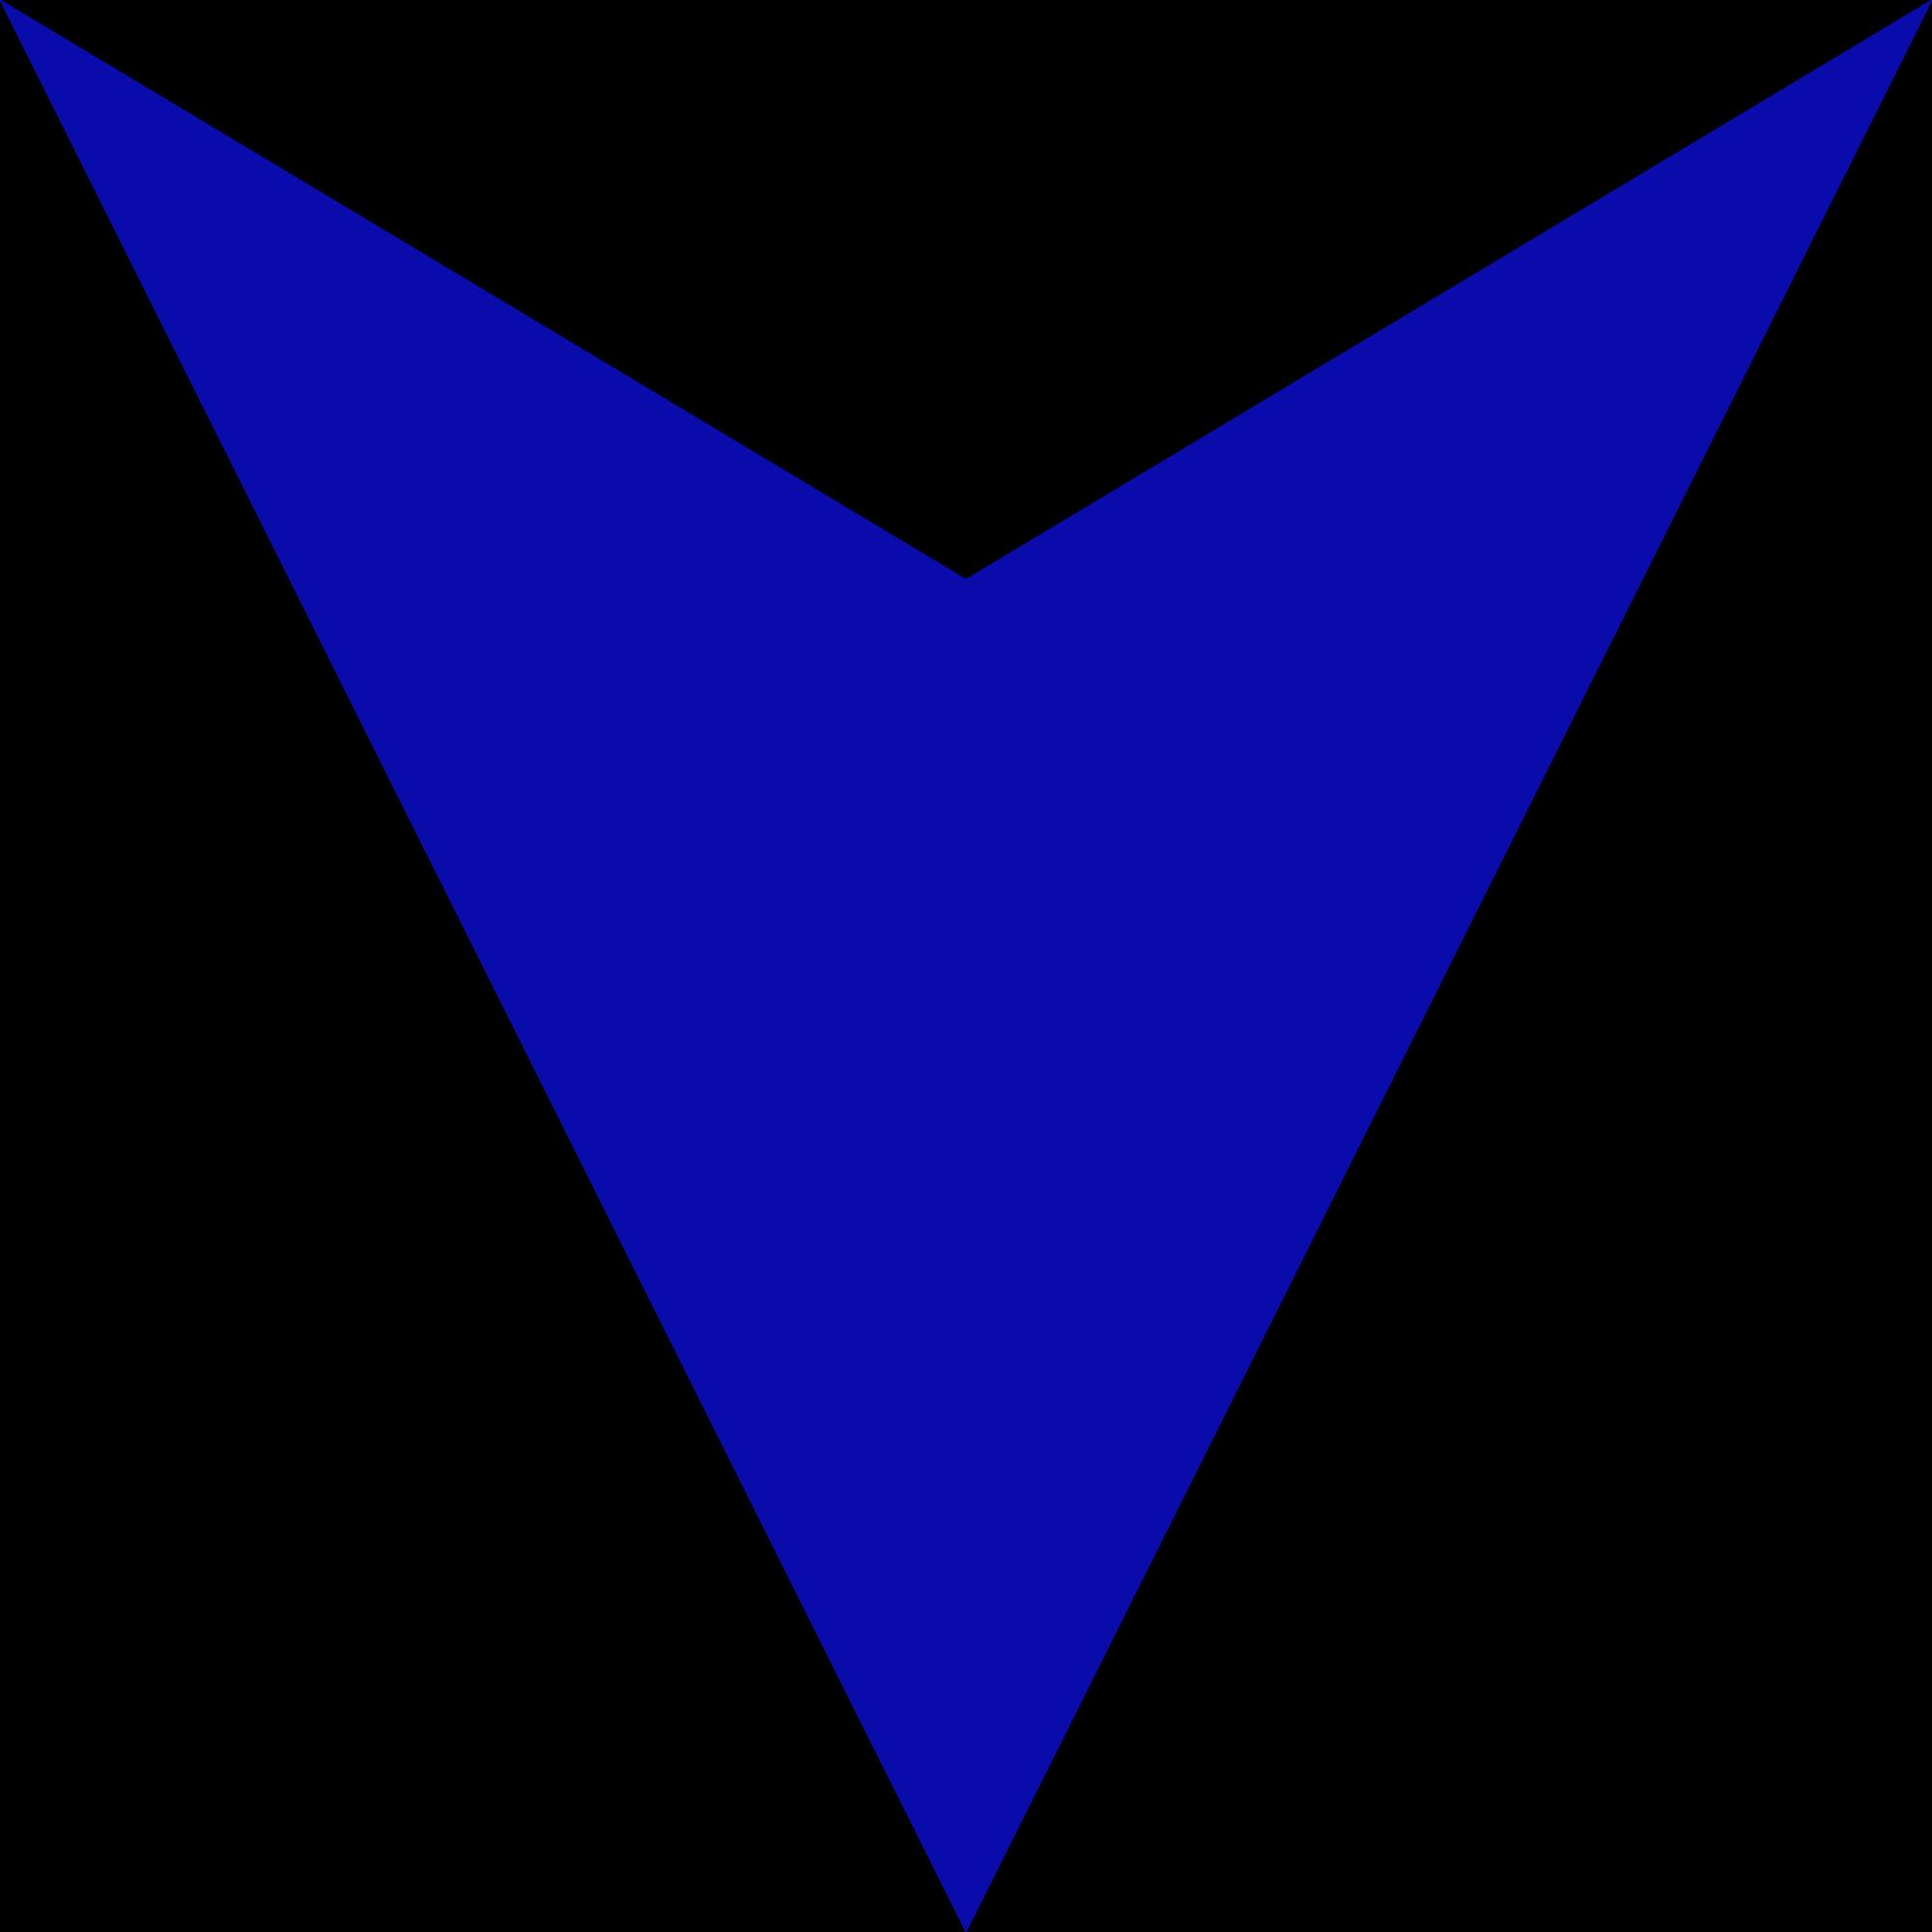 Blue Down Arrow - ClipArt Best